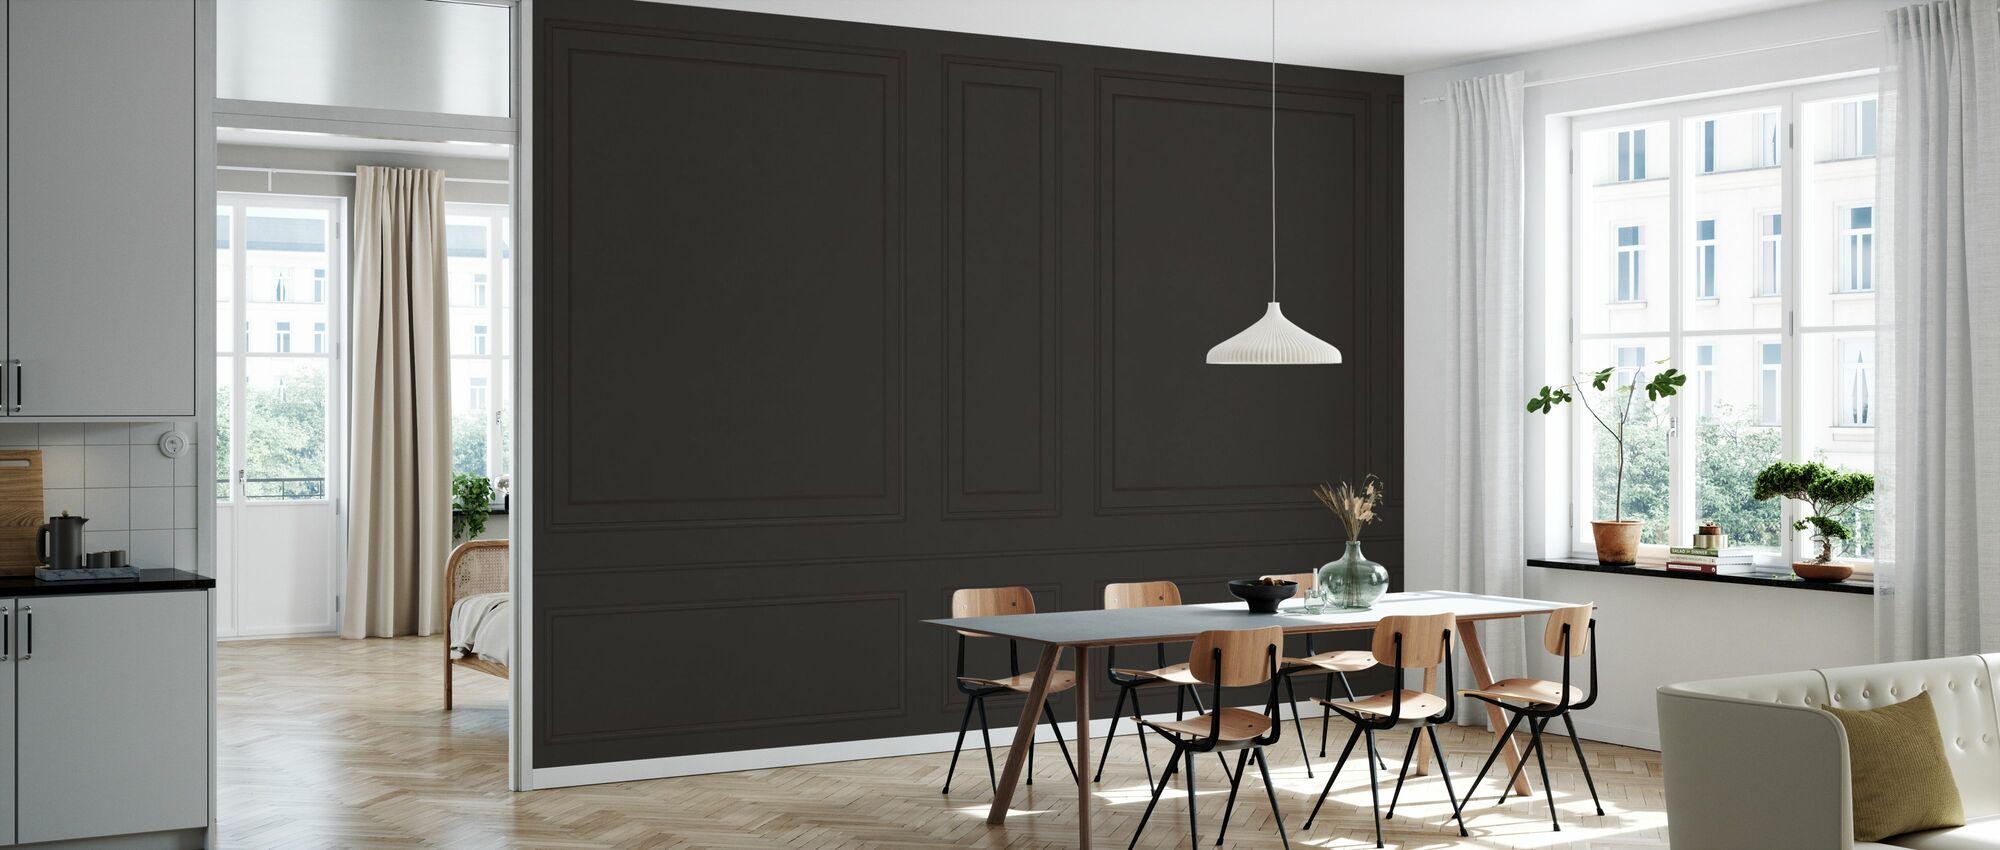 Voguish Wall Panel - Brown - Wallpaper - Kitchen